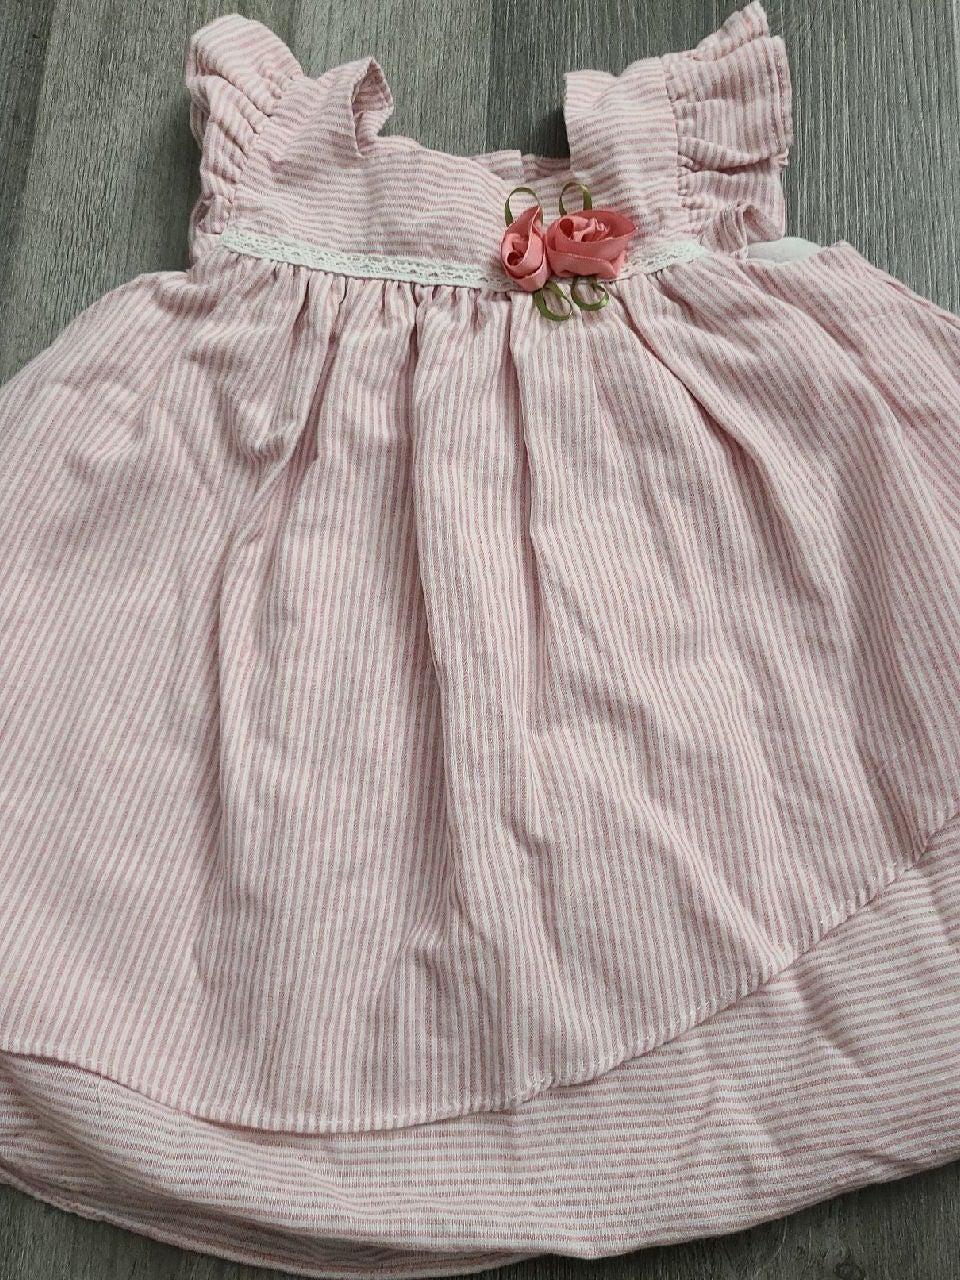 Dress 18 month